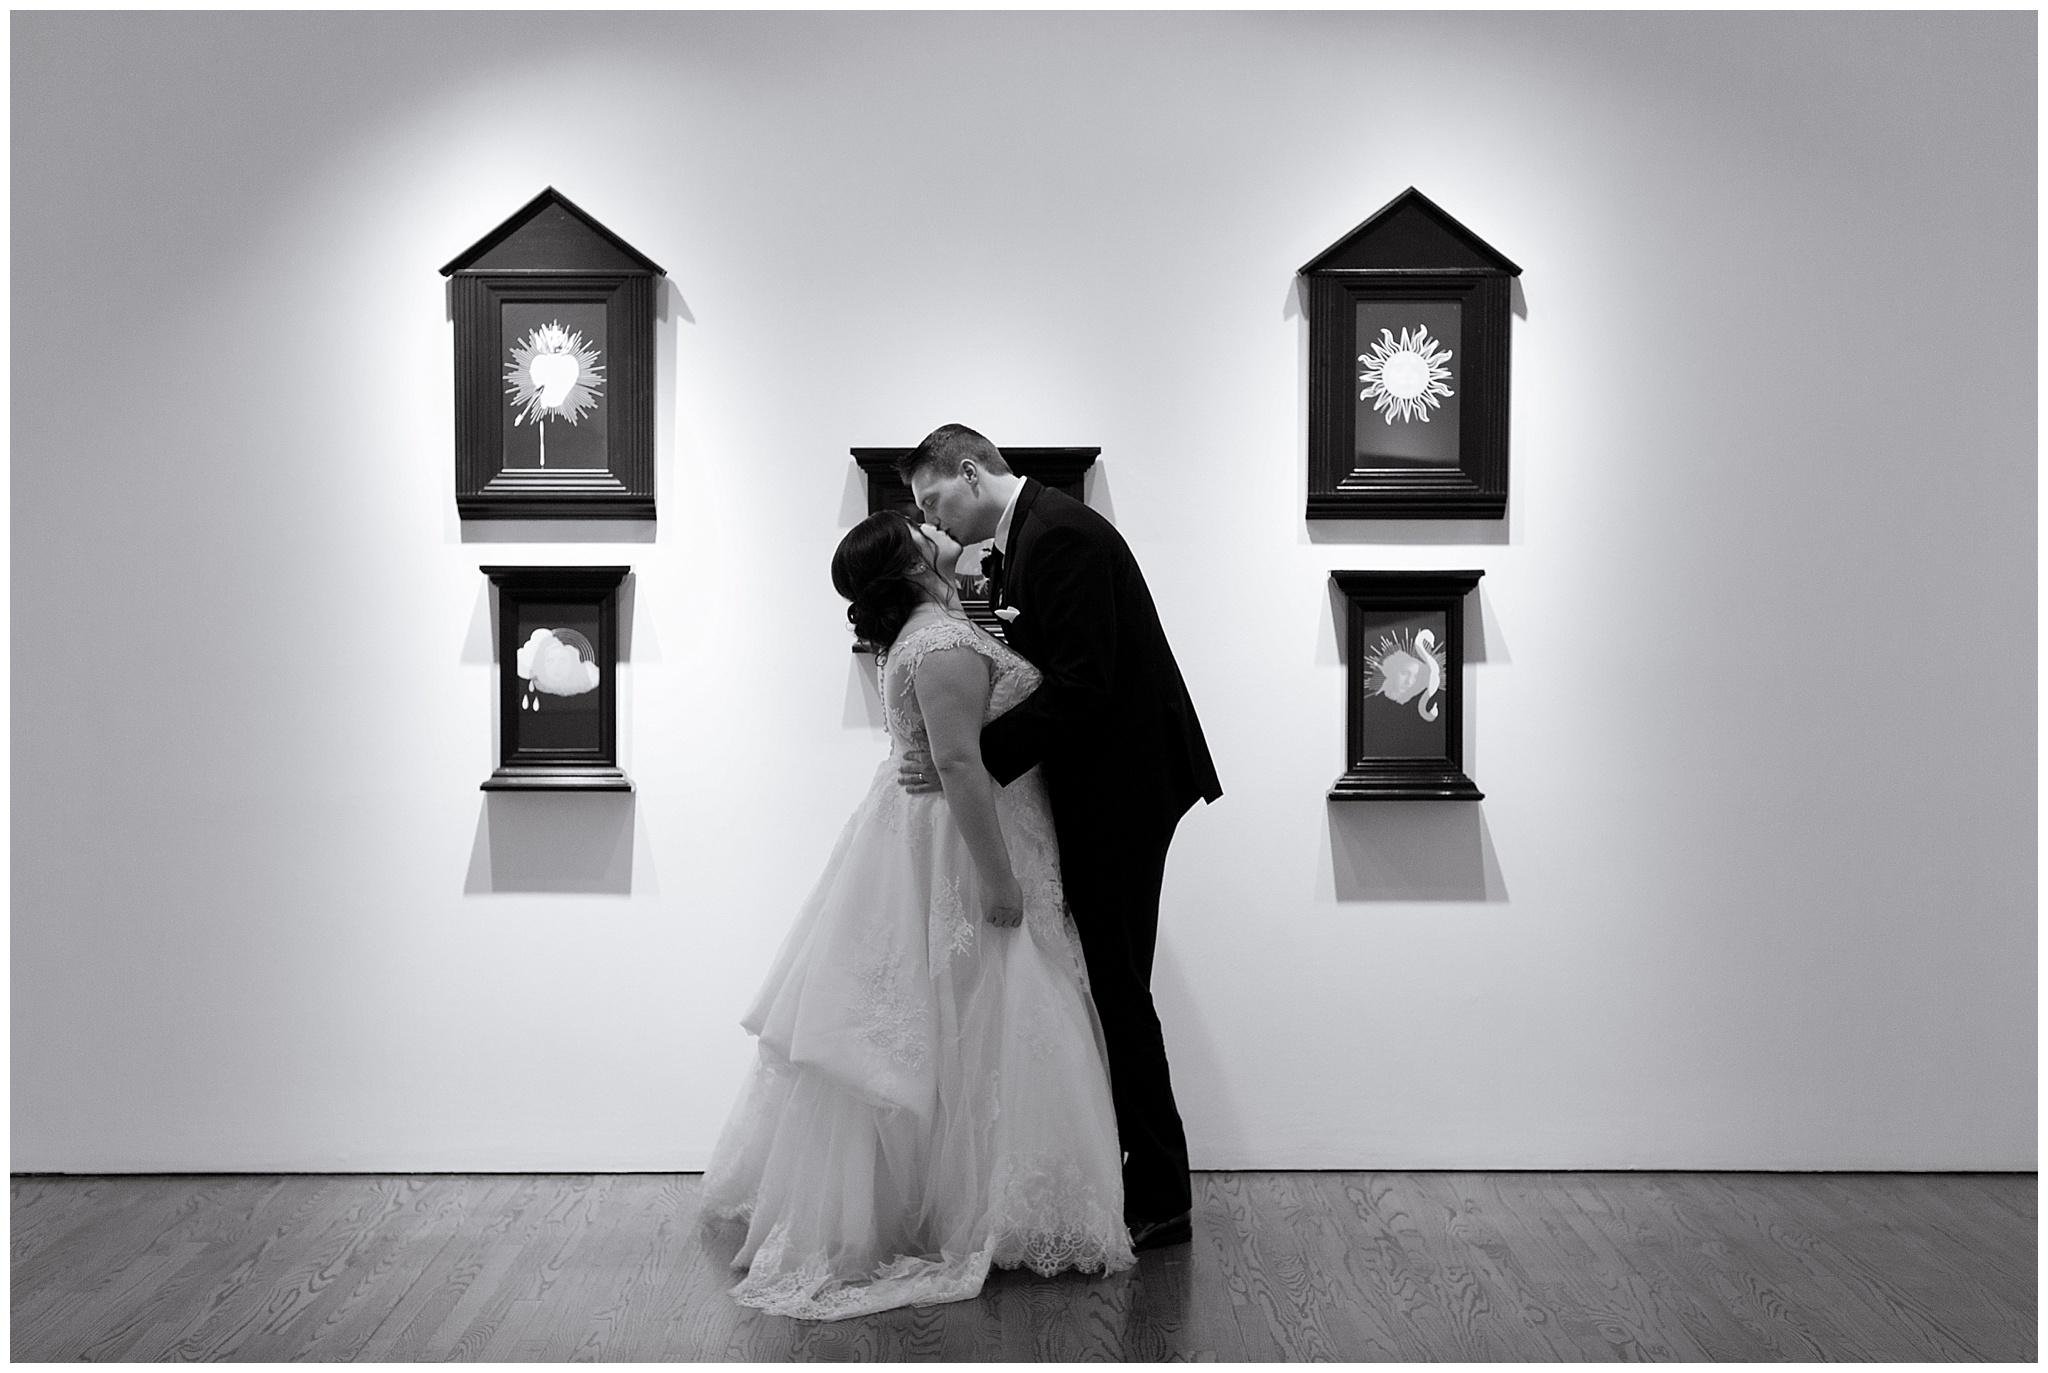 Carol_and_Grant_Wedding_3-3-18-8446-2.jpg